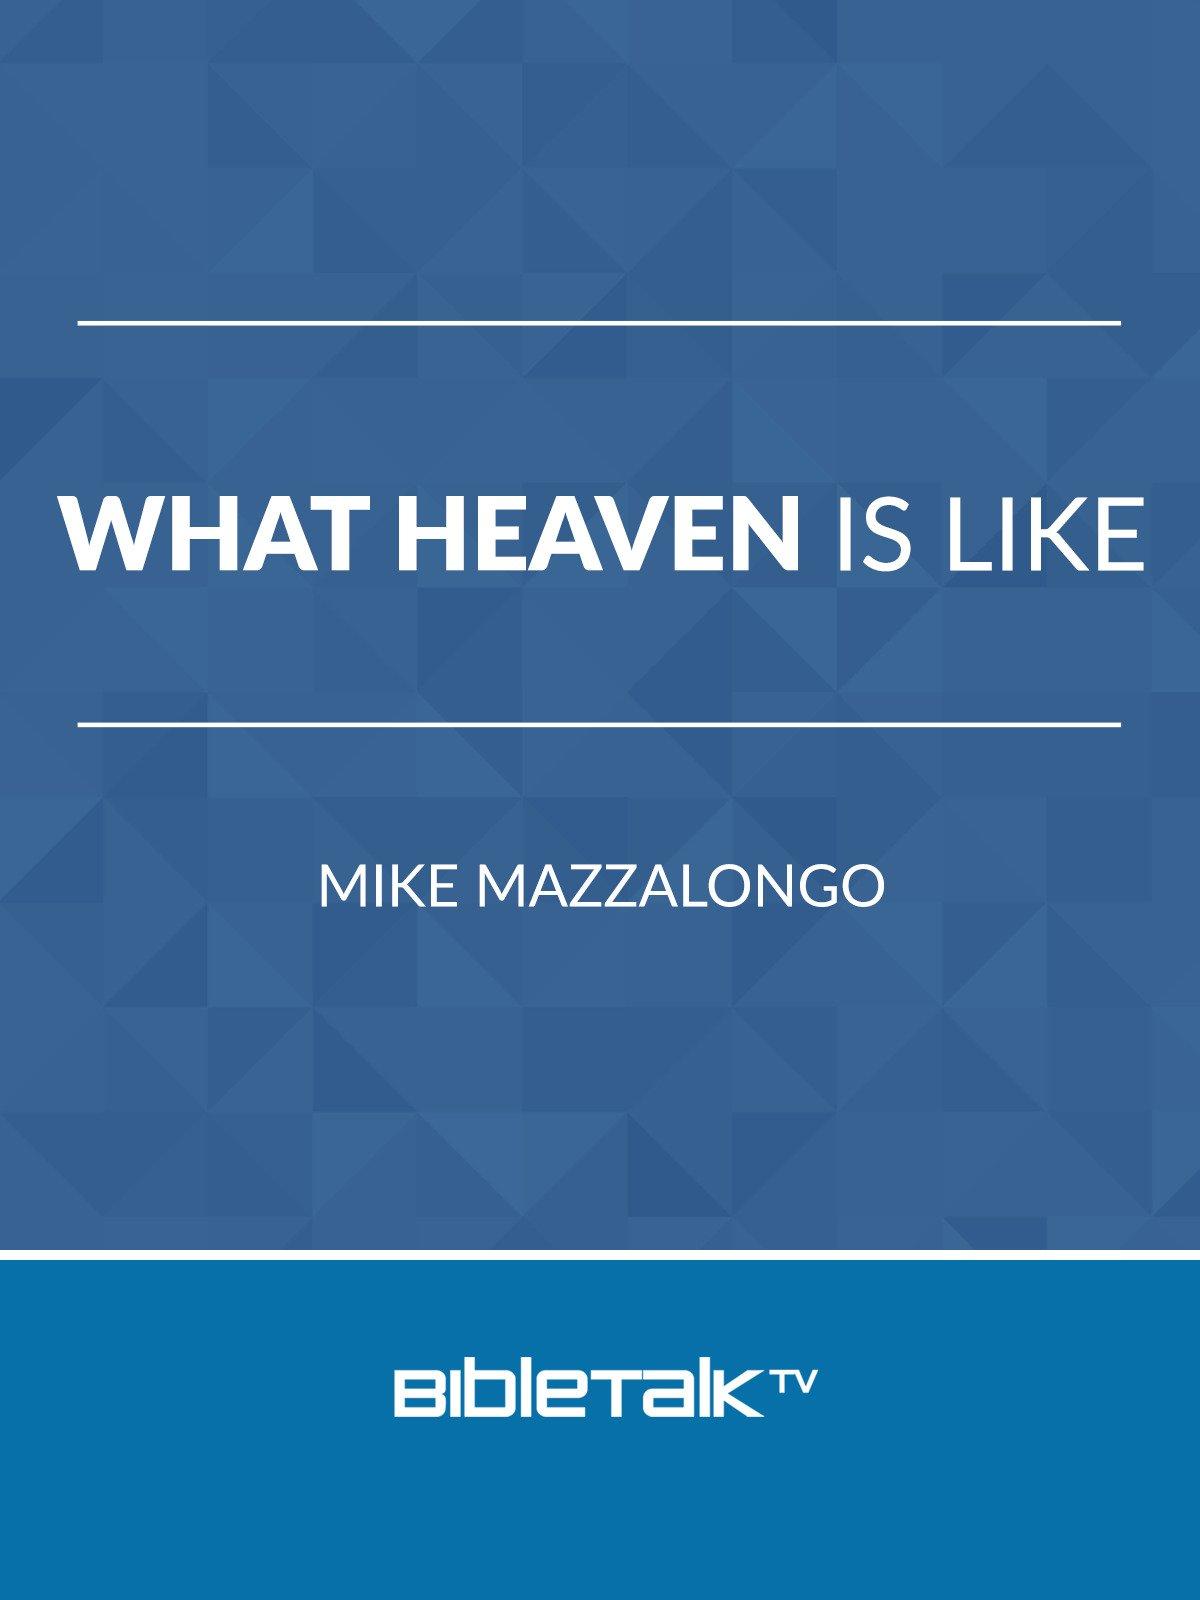 What Heaven is Like